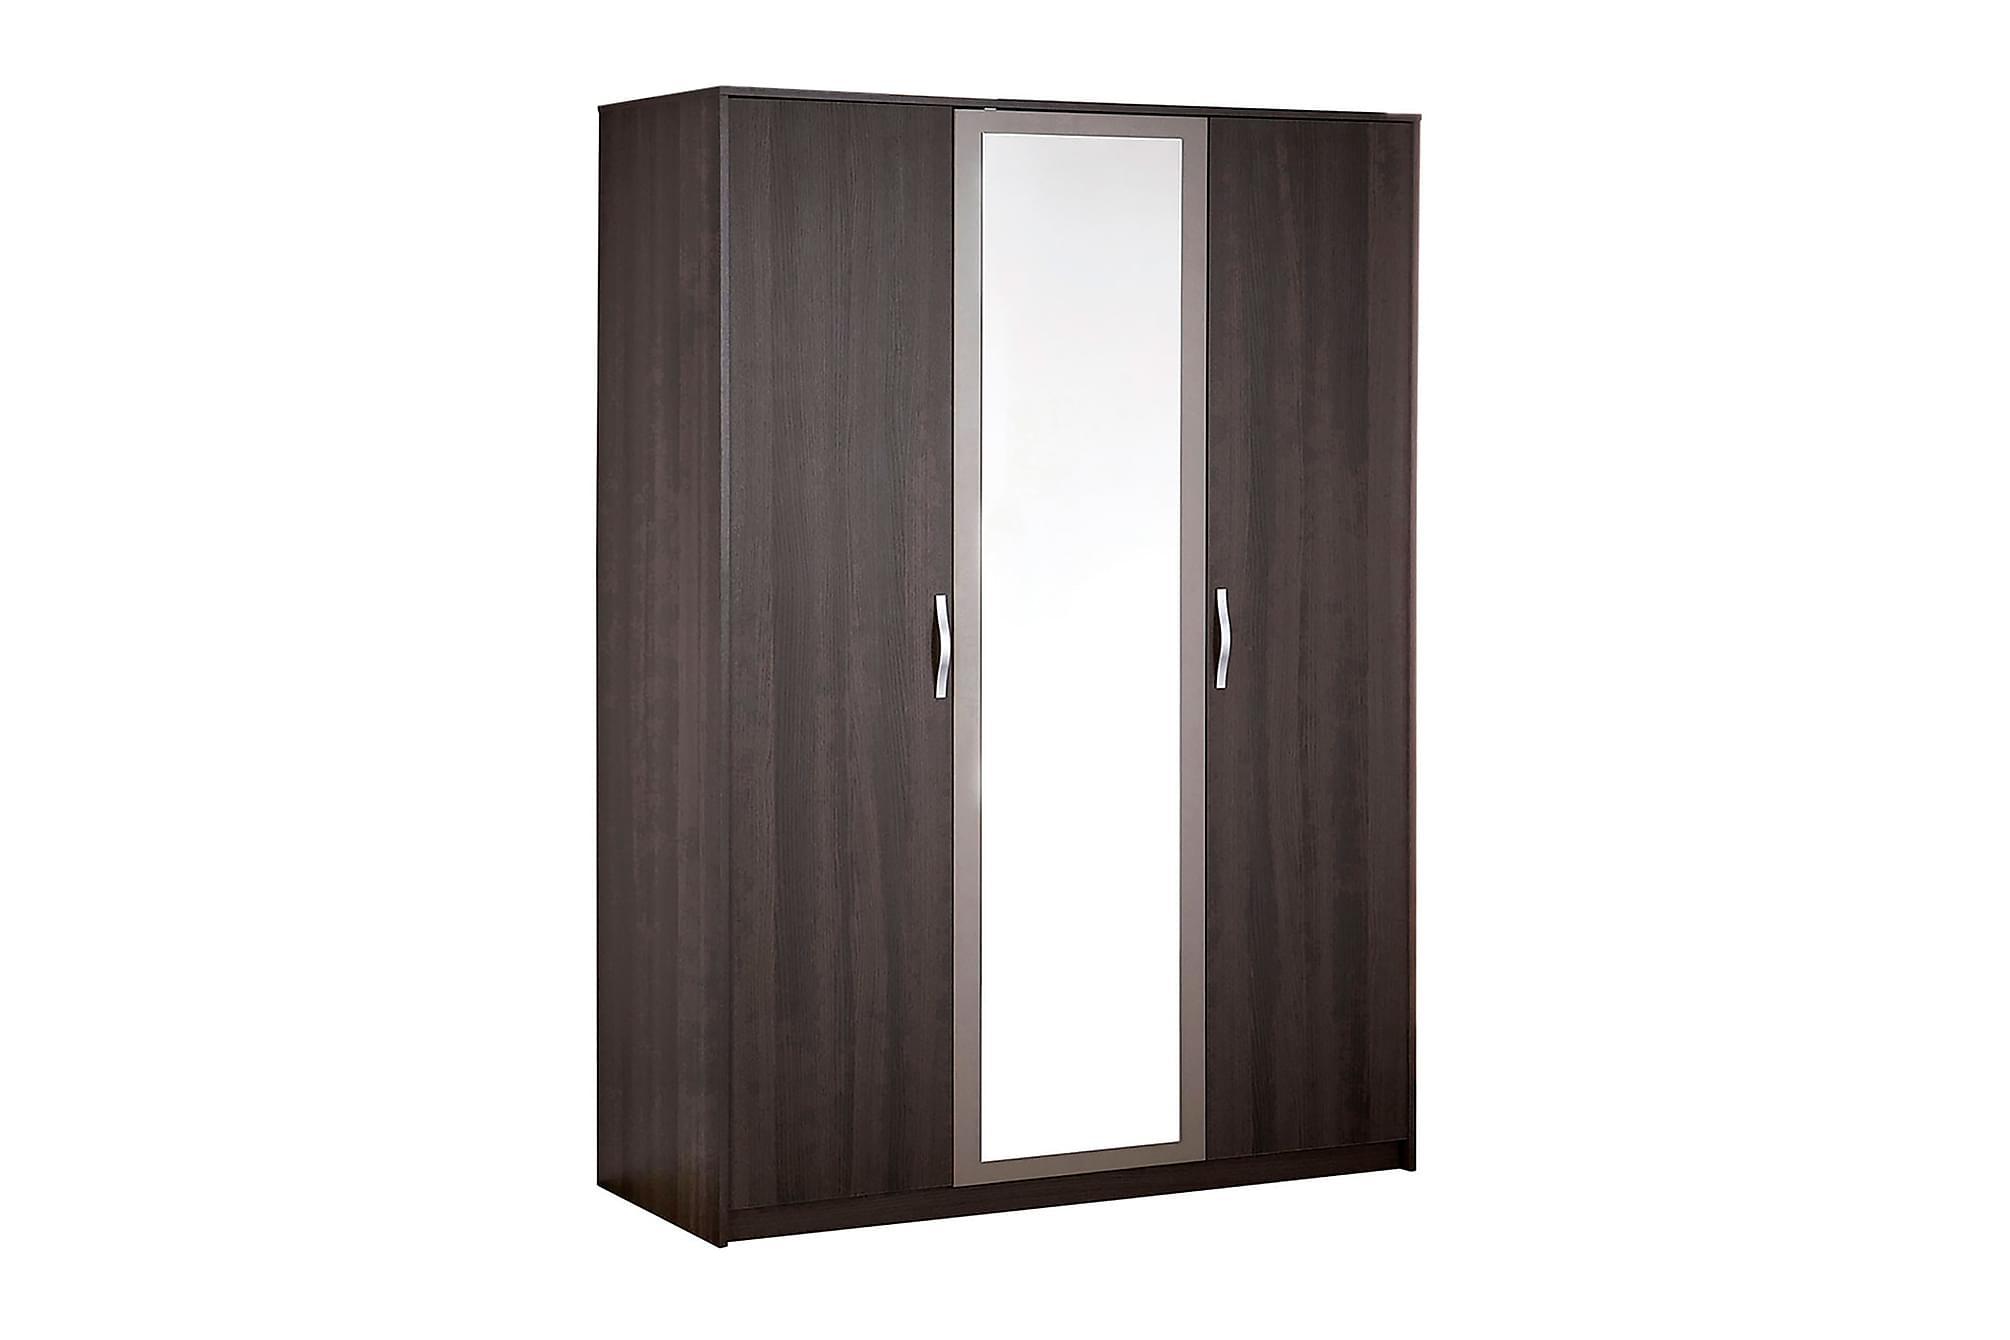 GRAPHIC Garderob 139 3 Dörrar Spegel Mörk Ek/Grå